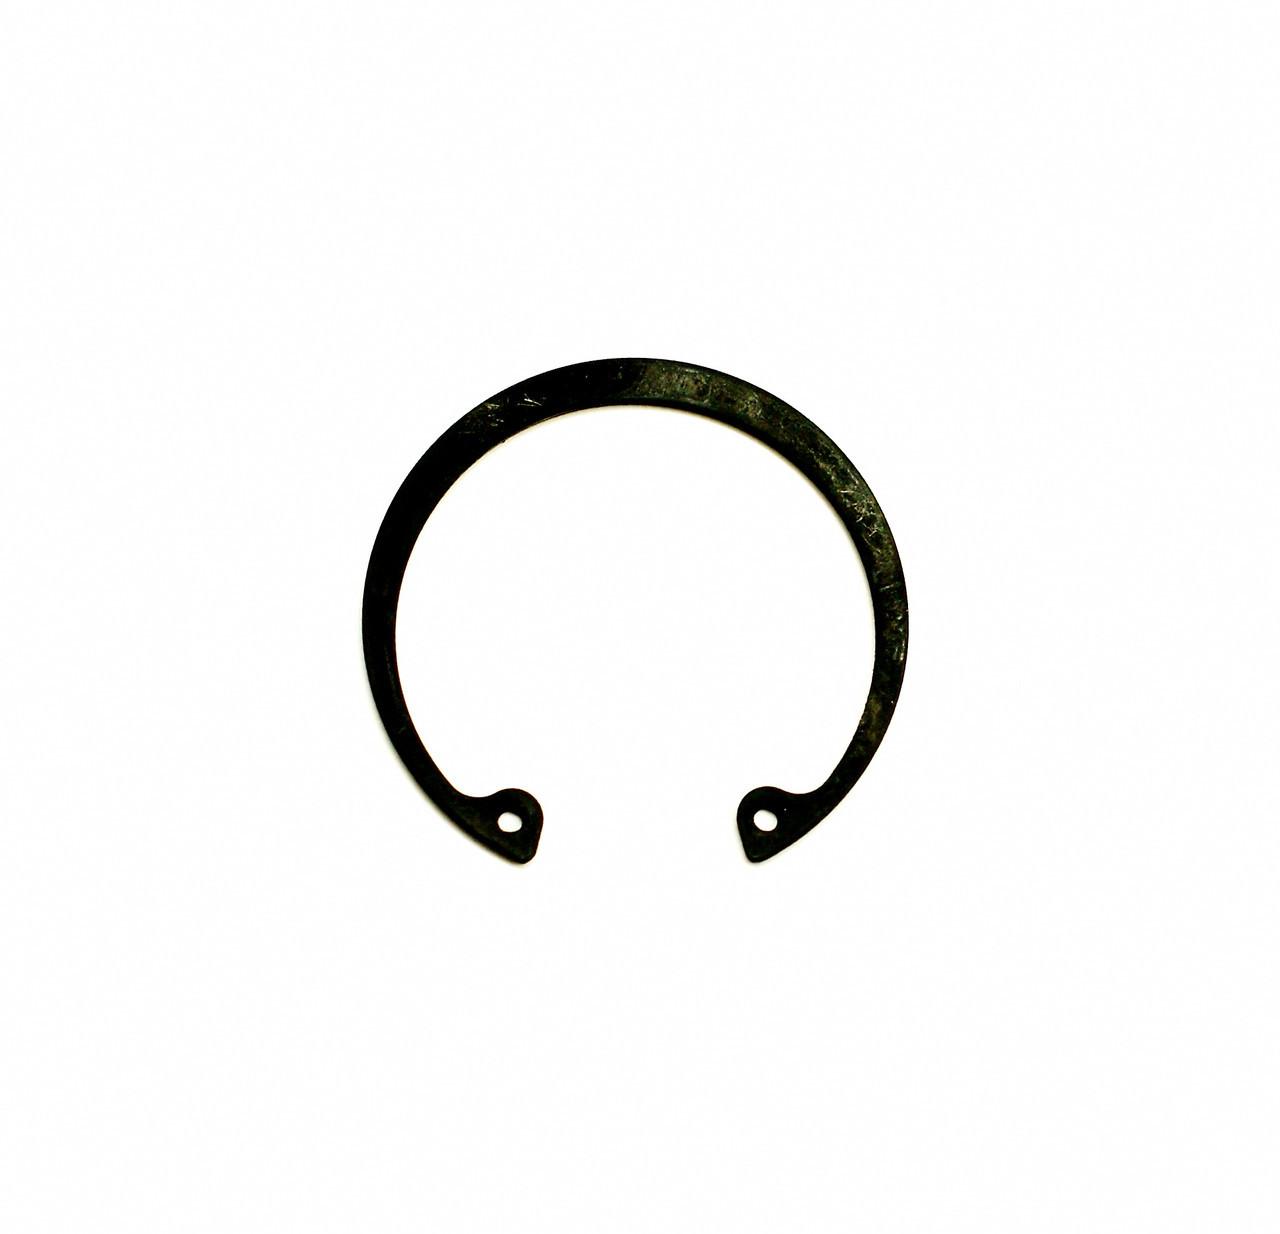 Кольцо стопорное Cummins C L Series C3920692 3920692 С3920692